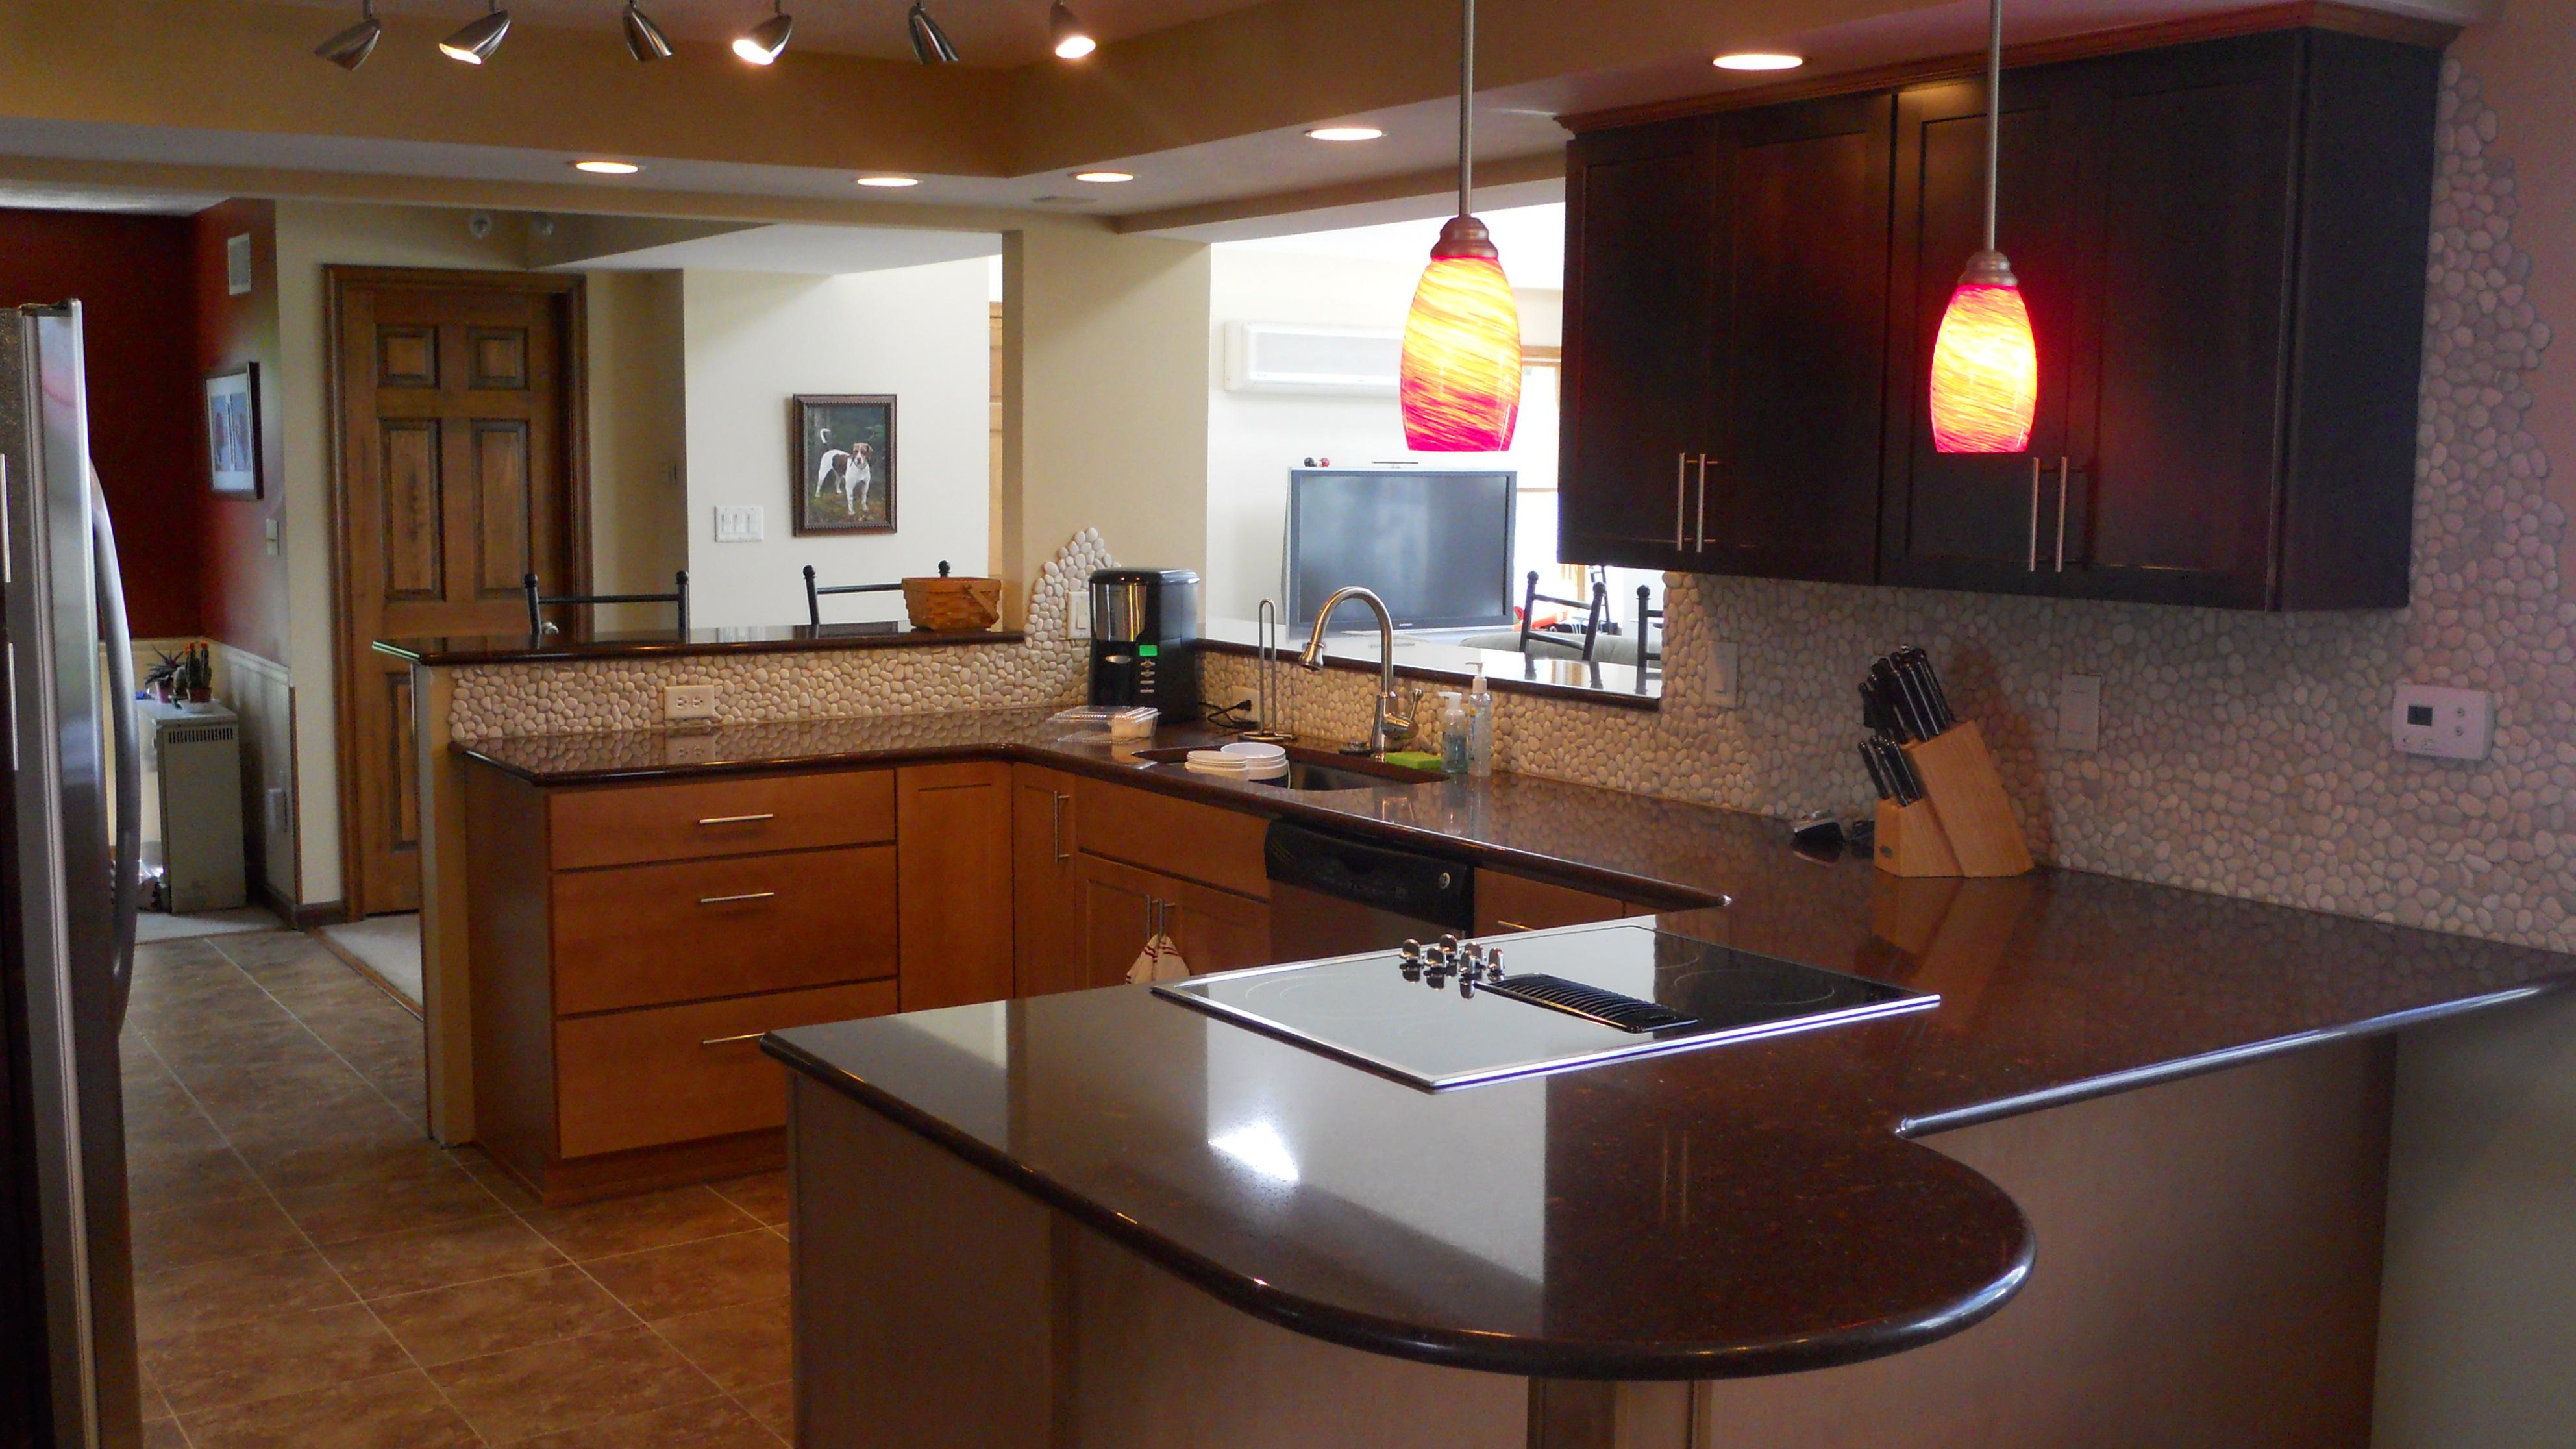 Ou0027Hanlon Kitchens, Inc Photos